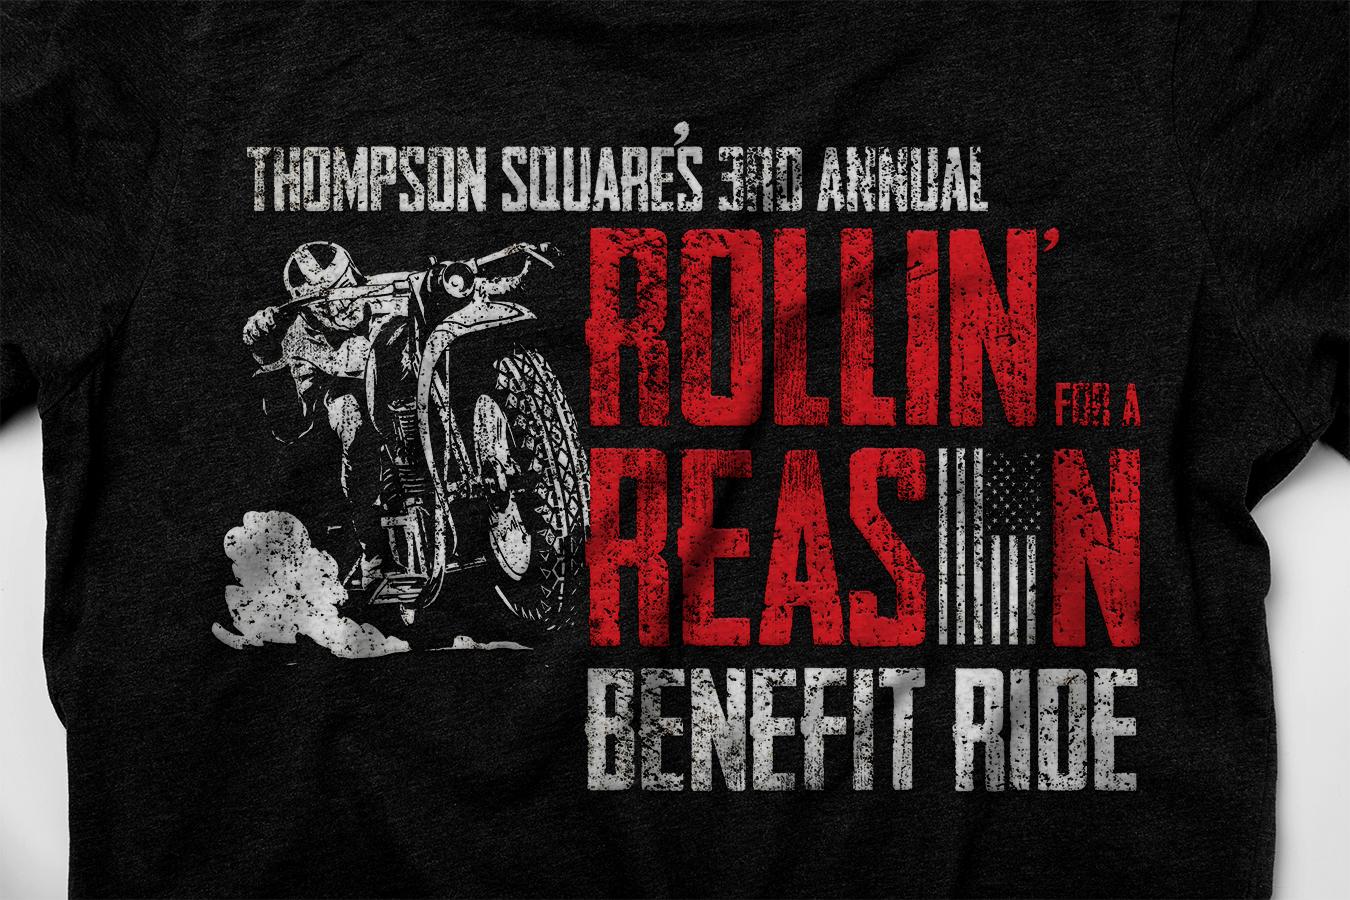 Rollin-Shirt.jpg